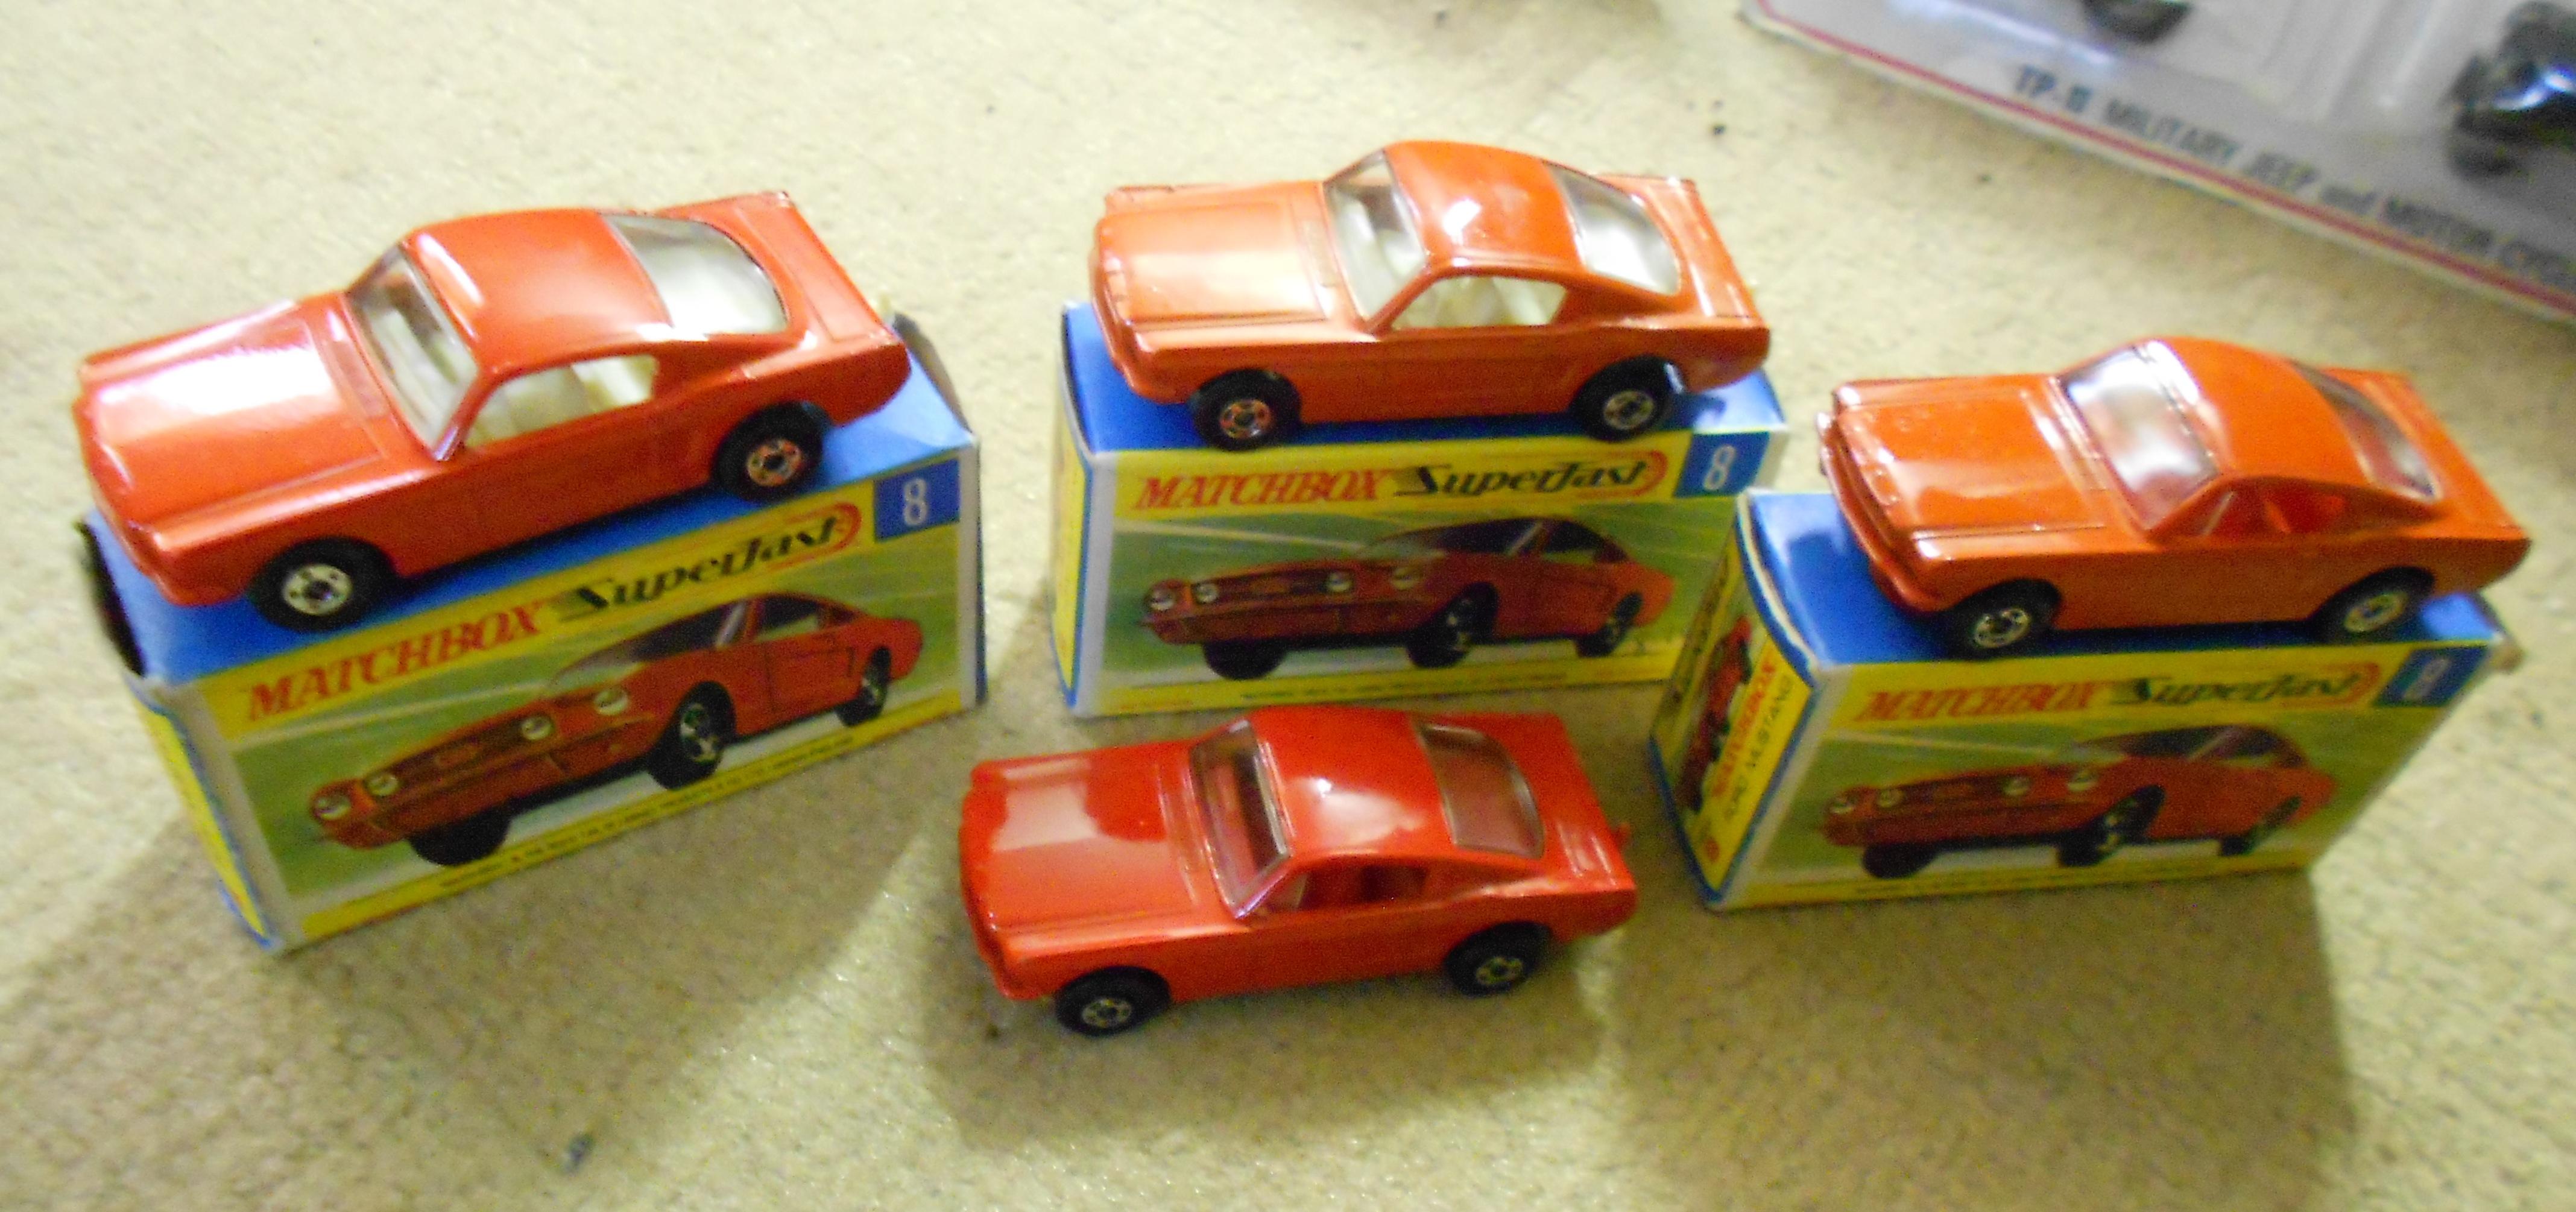 Quartettblog-Special: Die Superfast-Cars im Matchbox-Quartett von Piatnik